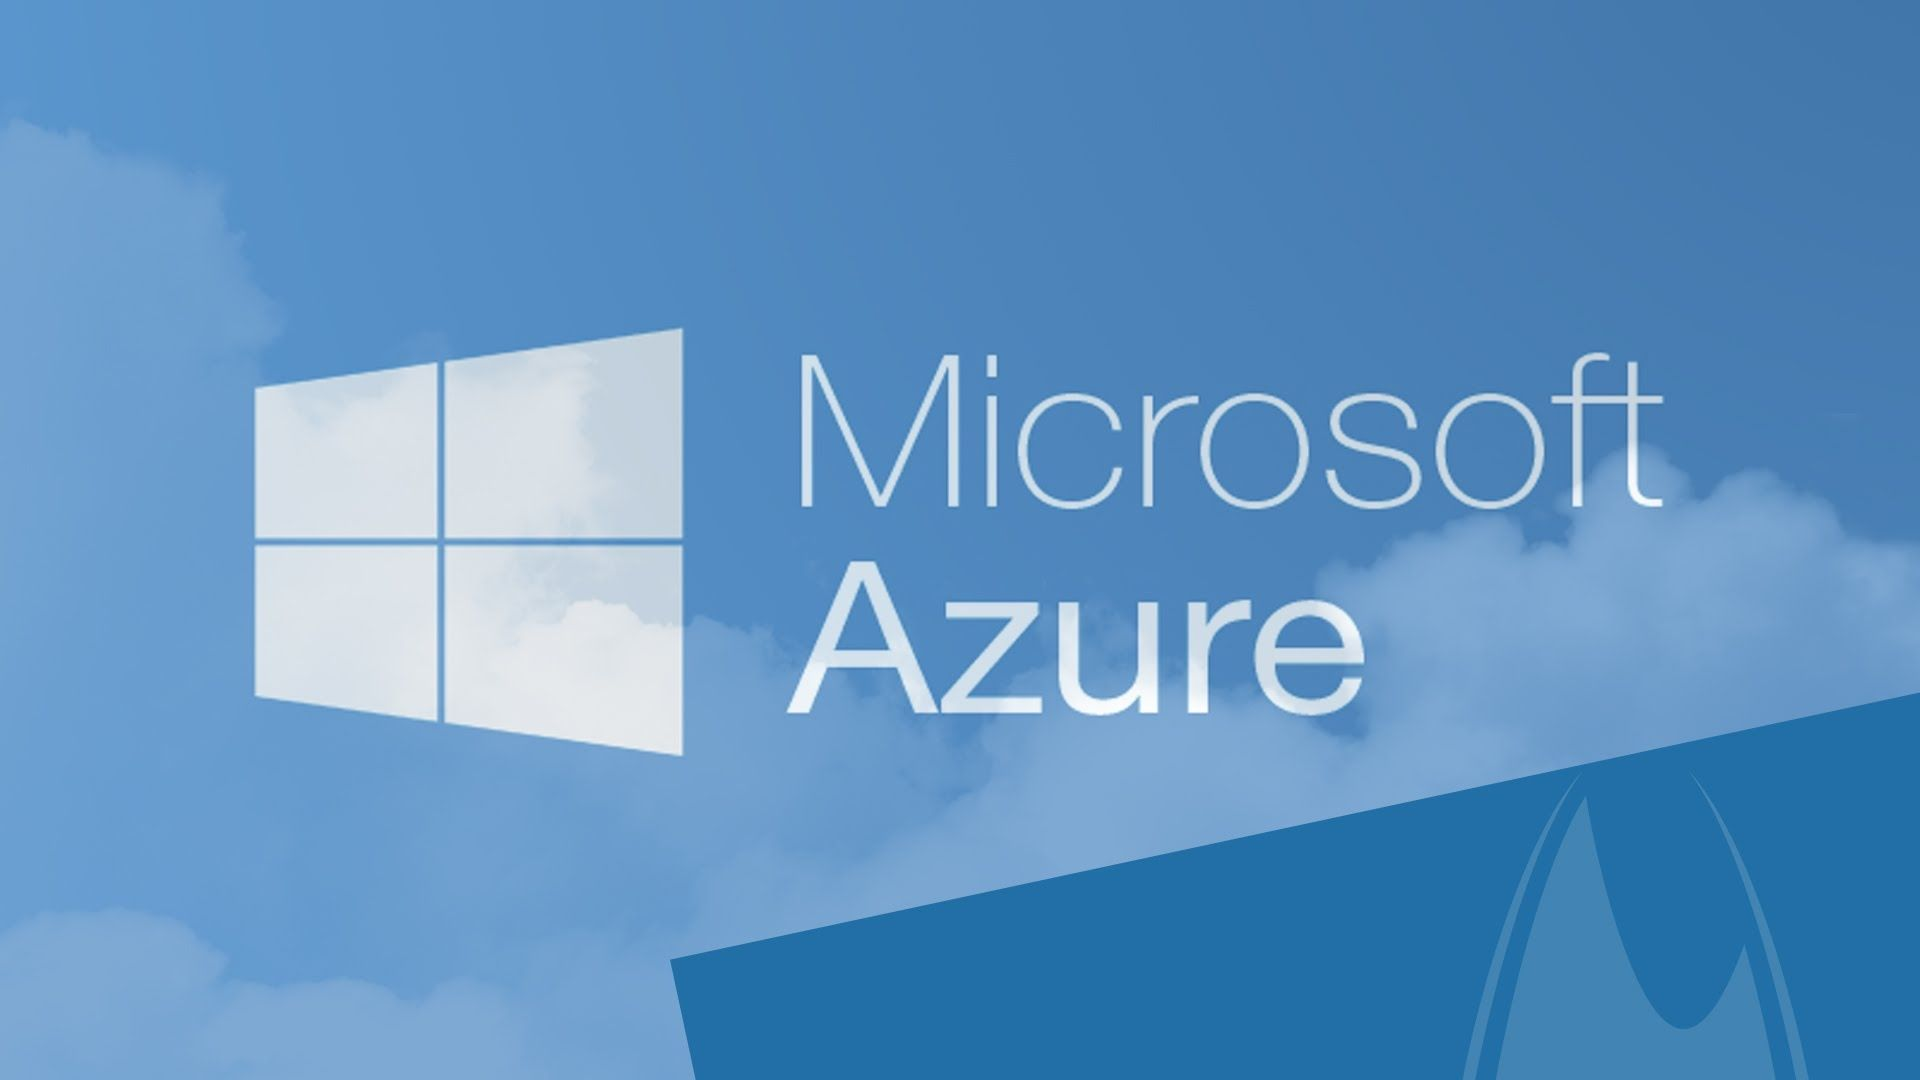 Azure发力 微软收购Cycle以后为谷歌、亚马逊提供服务